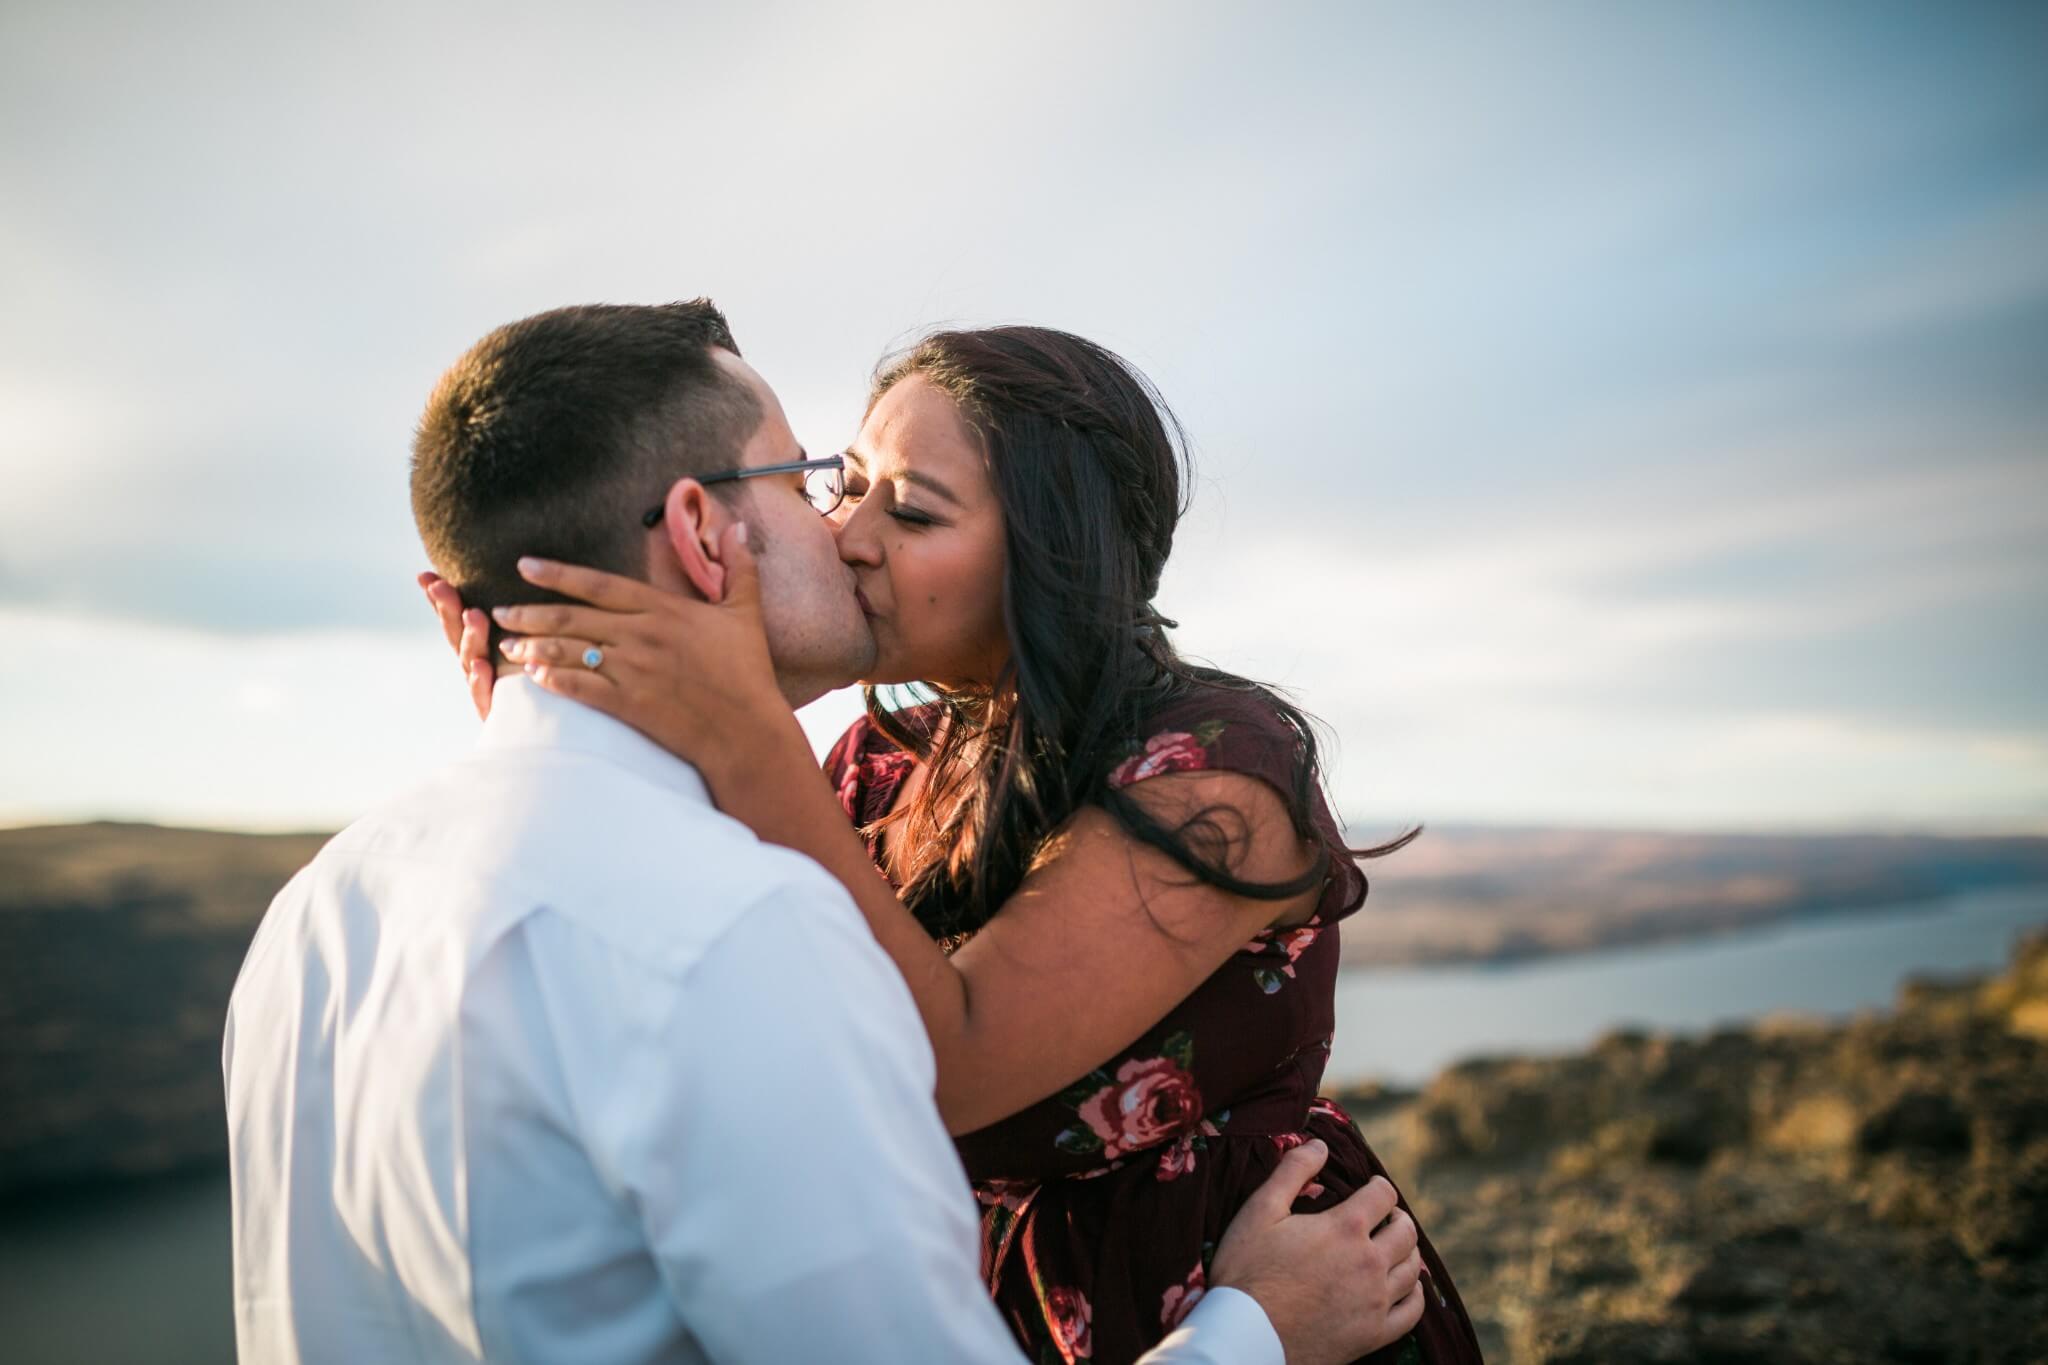 Lesly & Michael Vantage Engagement by Bill Weisgerber Spokane Photographer (29 of 71).jpg